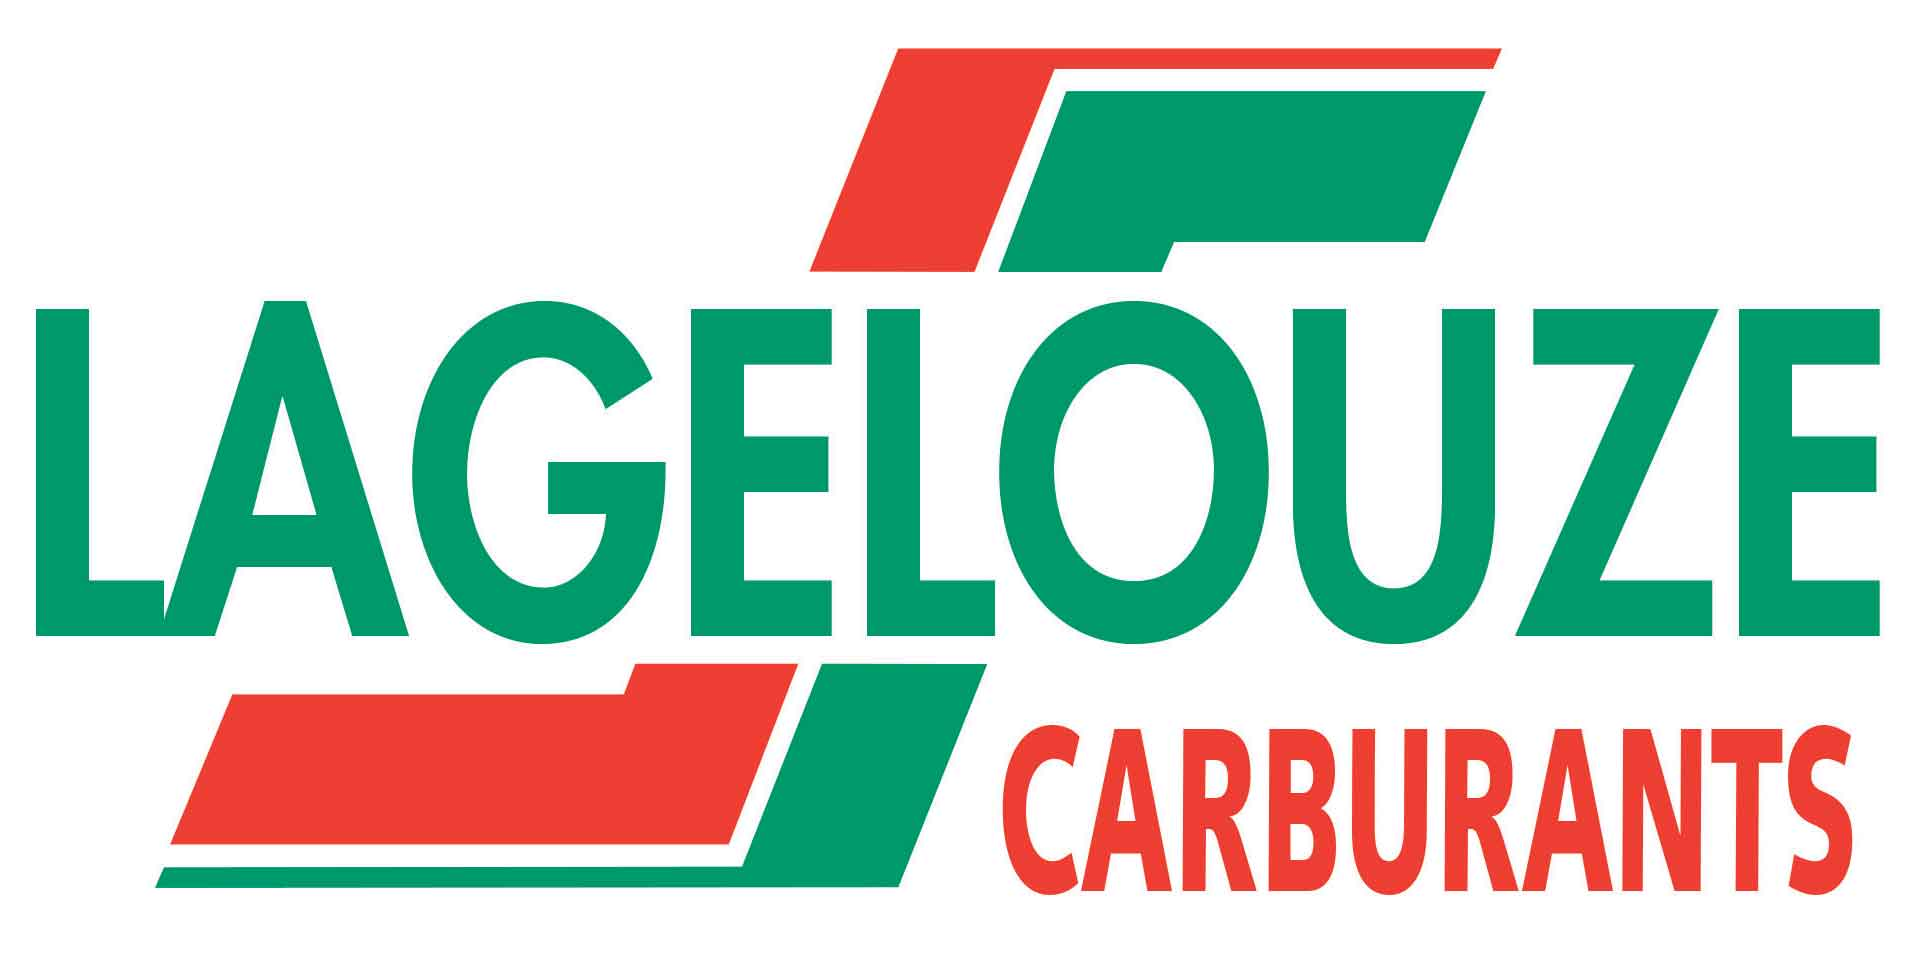 Lagelouze Carburants